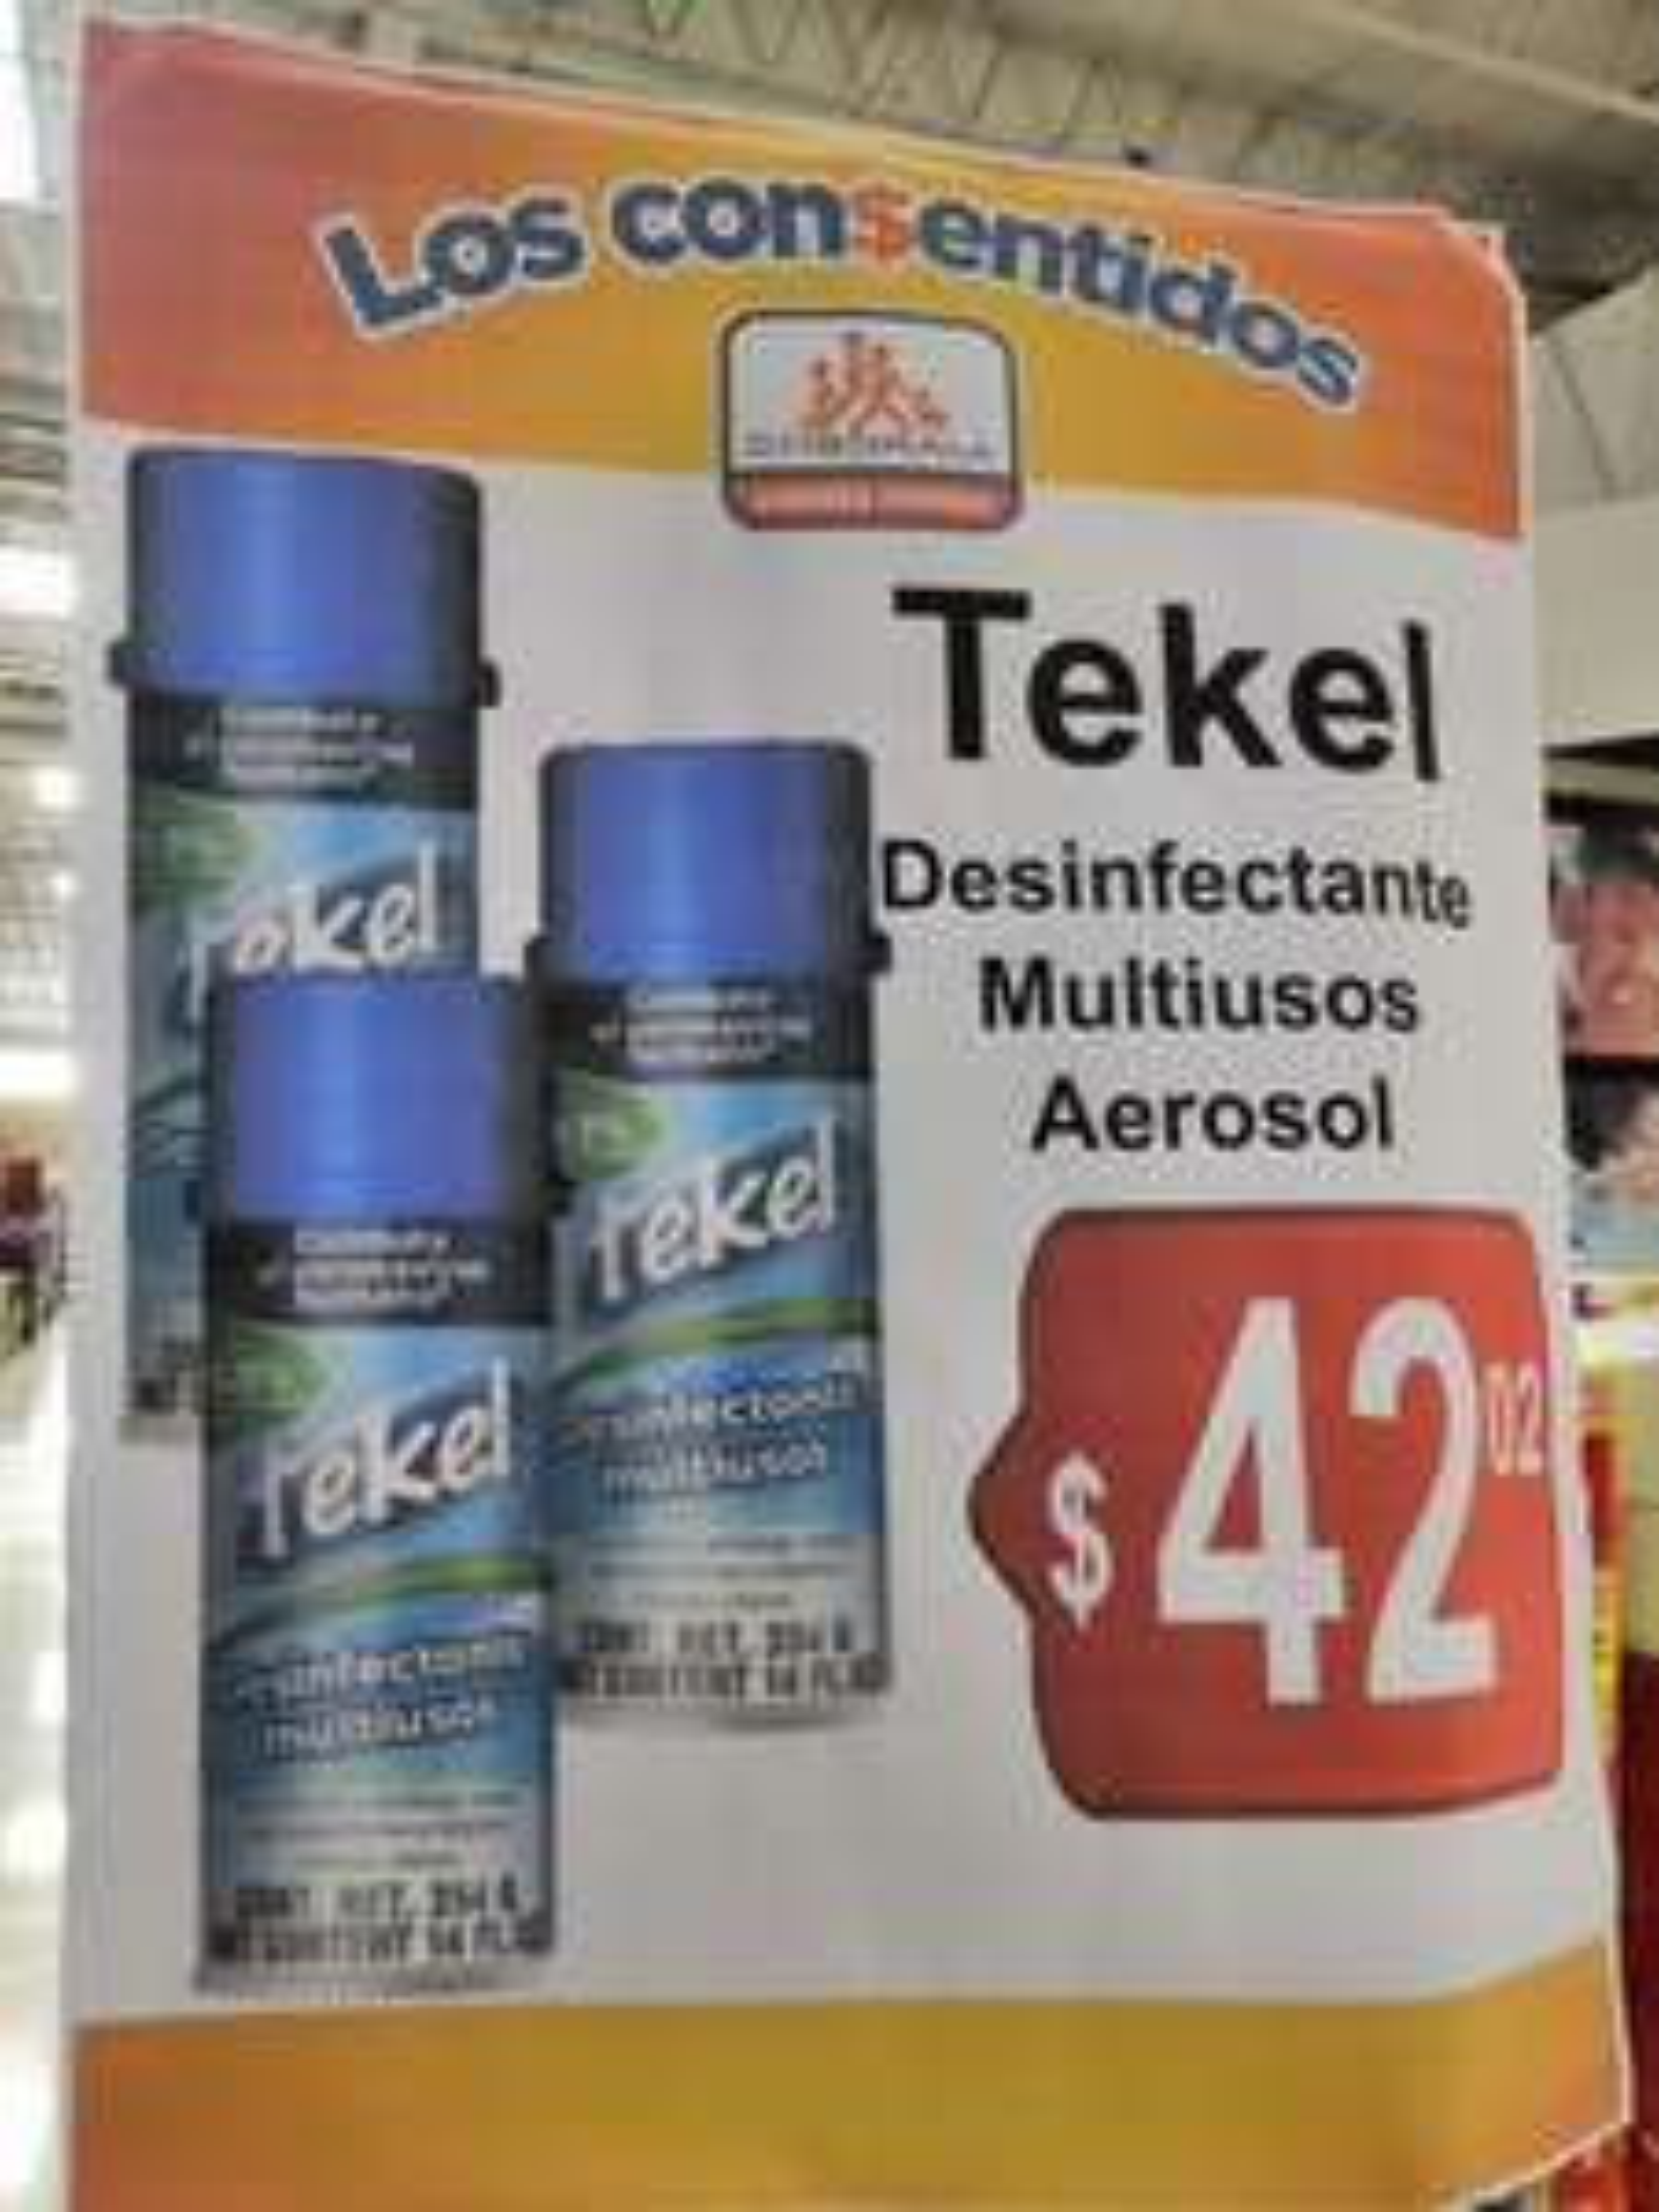 Chedraui Coapa: Desinfectante multiusos aerosol Tekel 354 g. $42.02